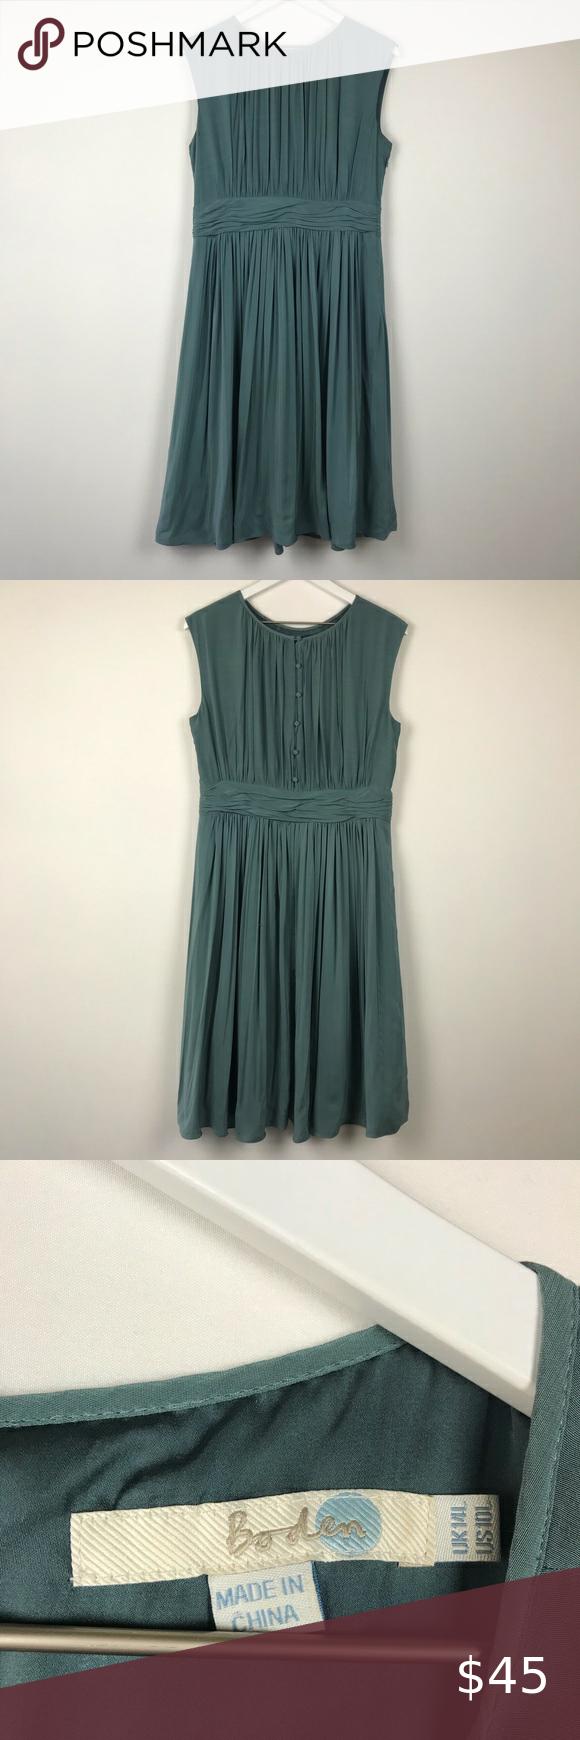 Boden Selina Pleated Slate Blue Sleeveless Dress